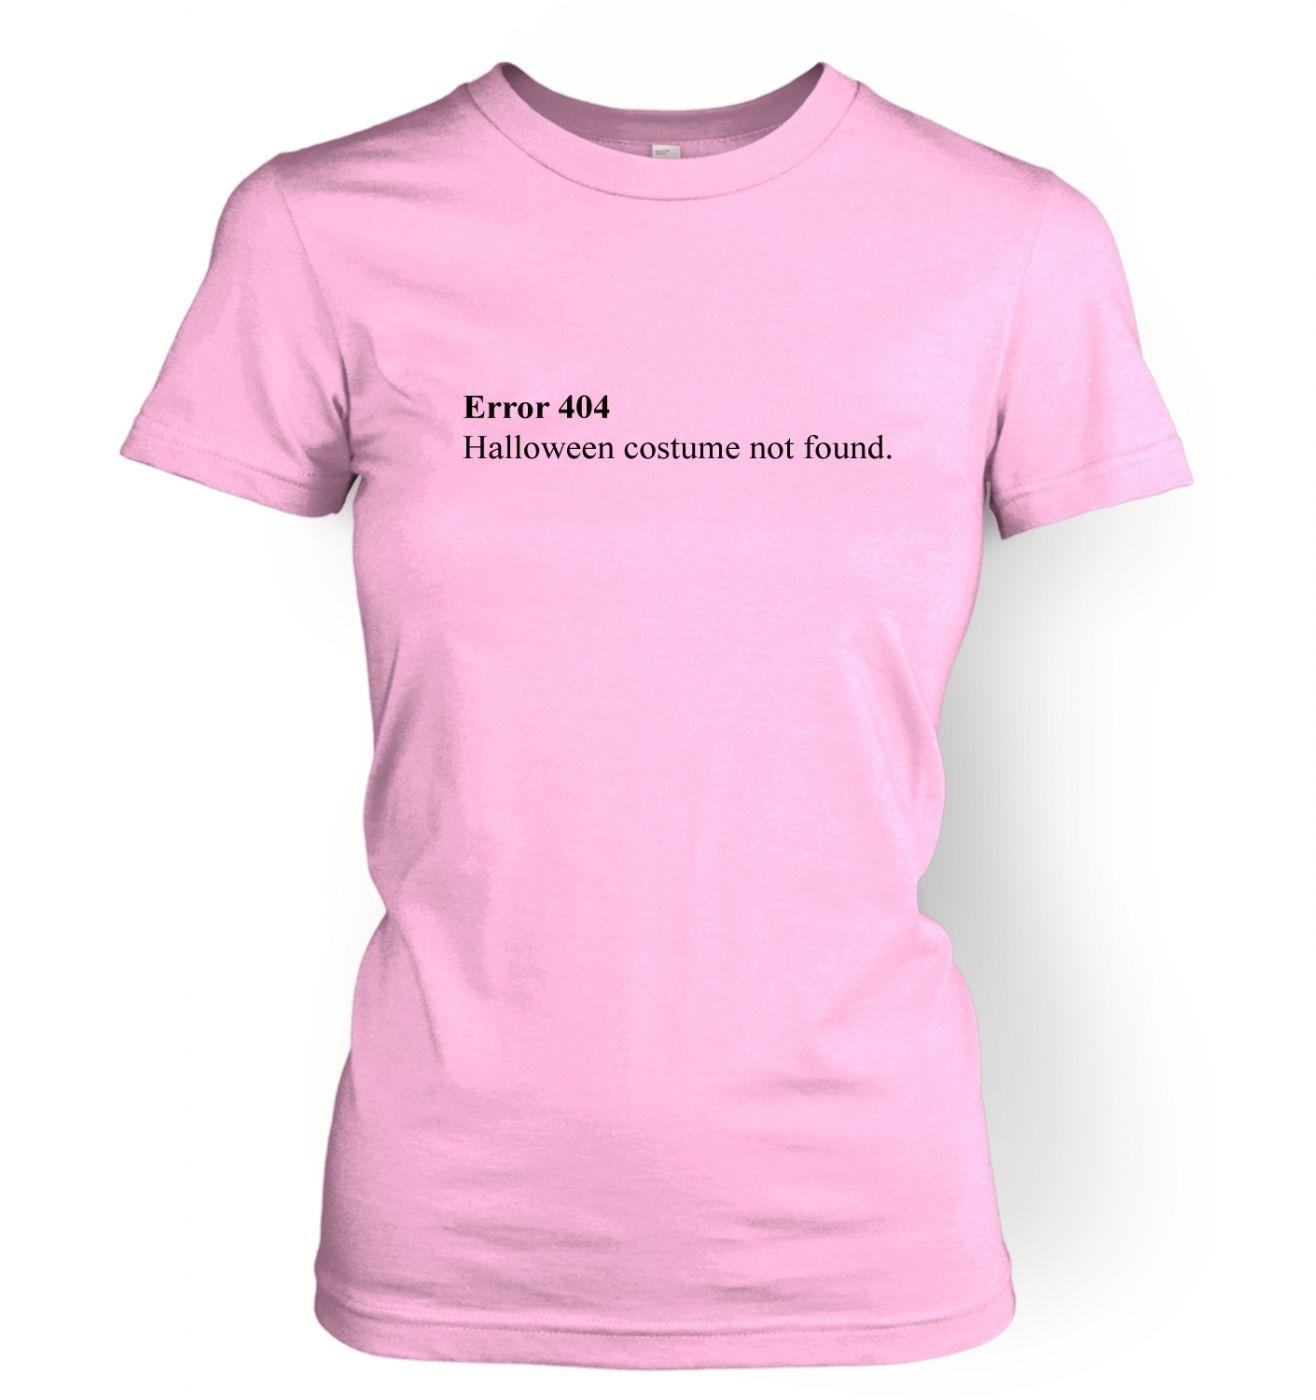 Error 404 Halloween Costume Not Found women's t-shirt